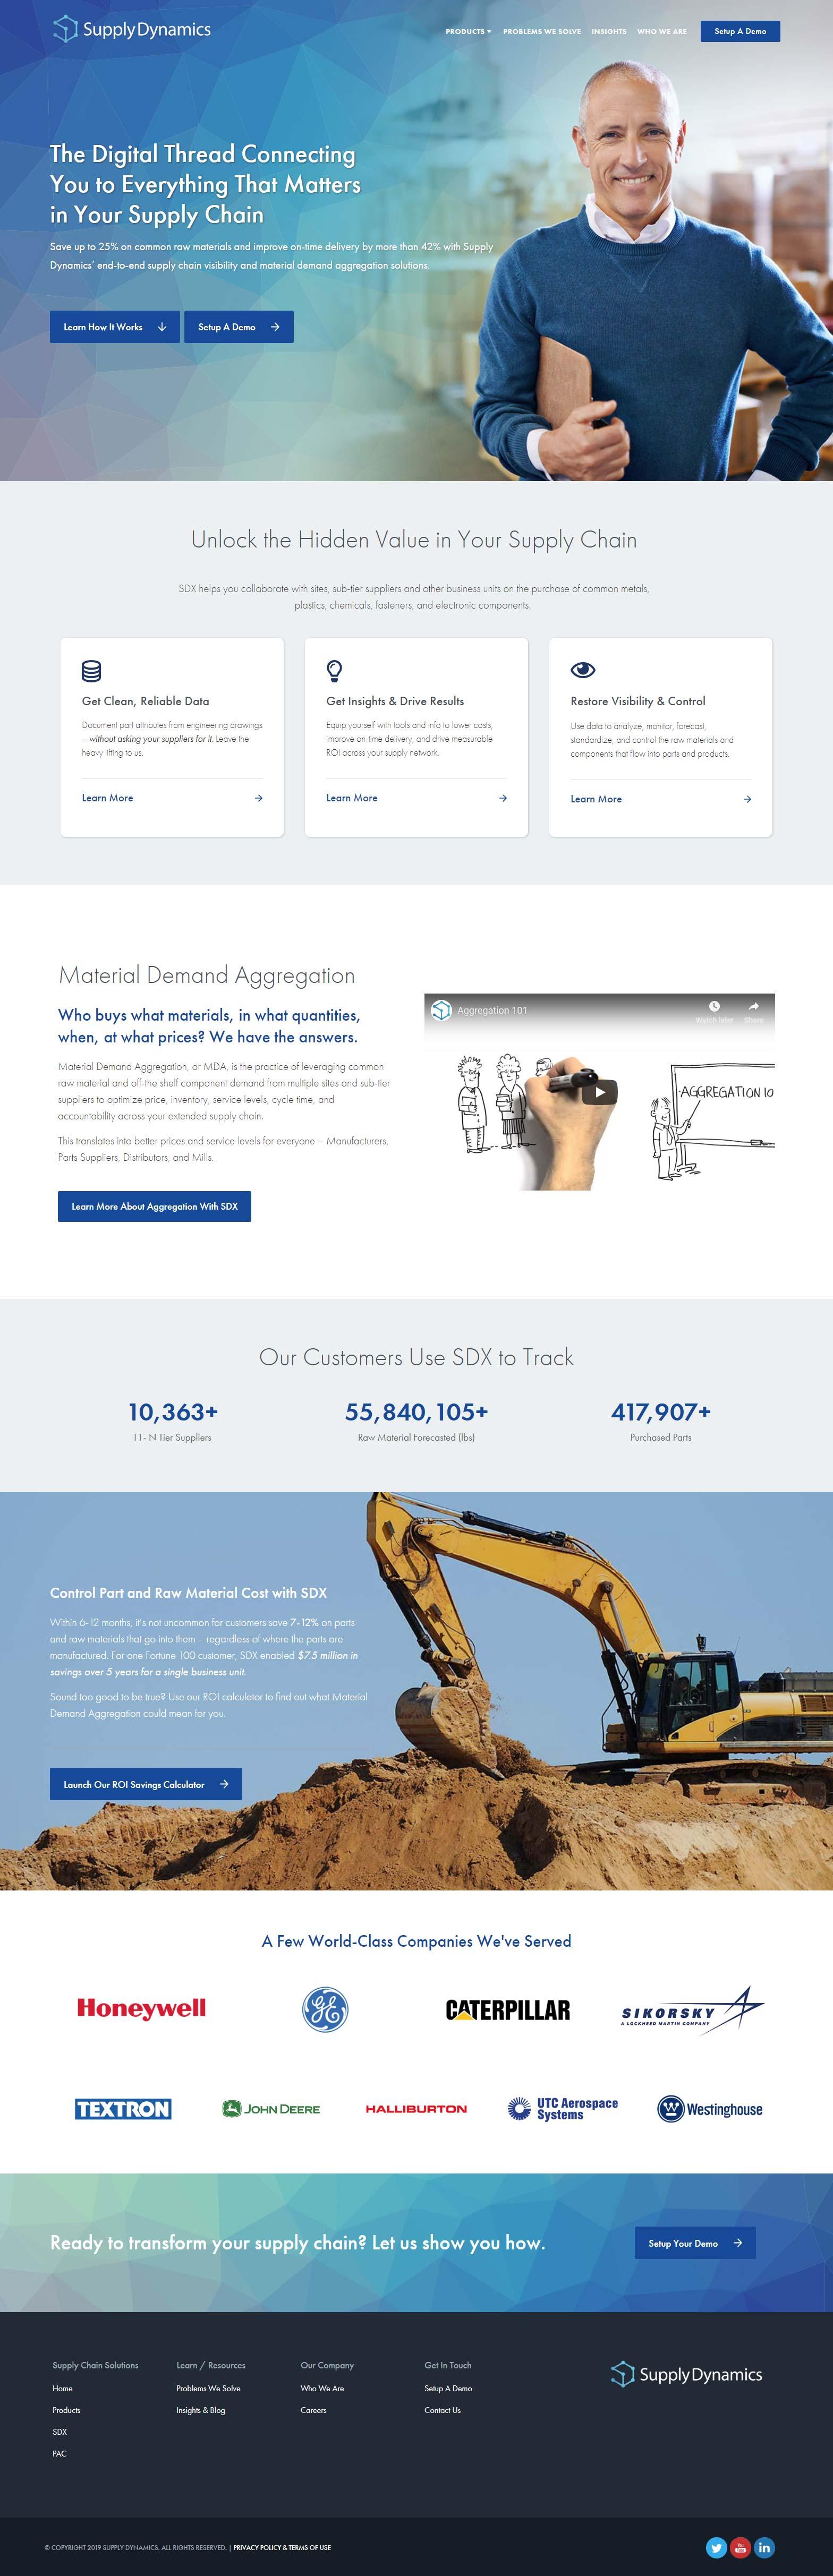 supply-dynamics-website